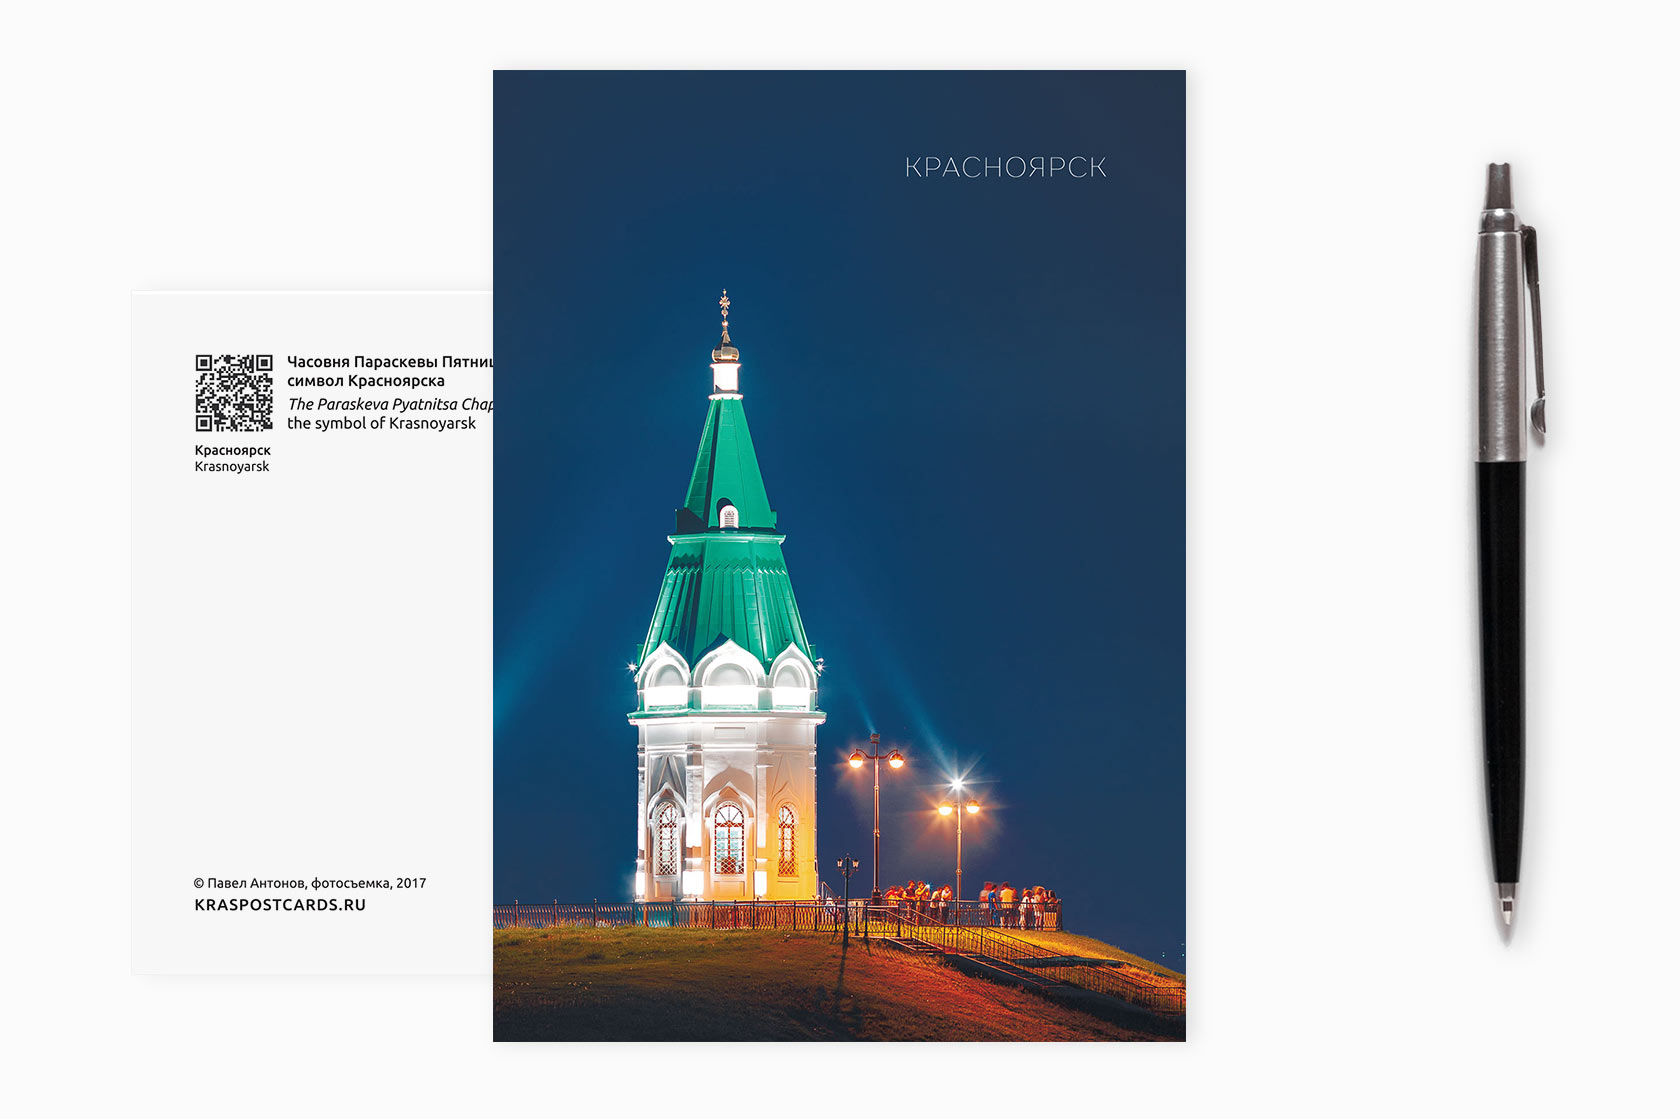 Интернет-магазин открытки красноярск, картинка